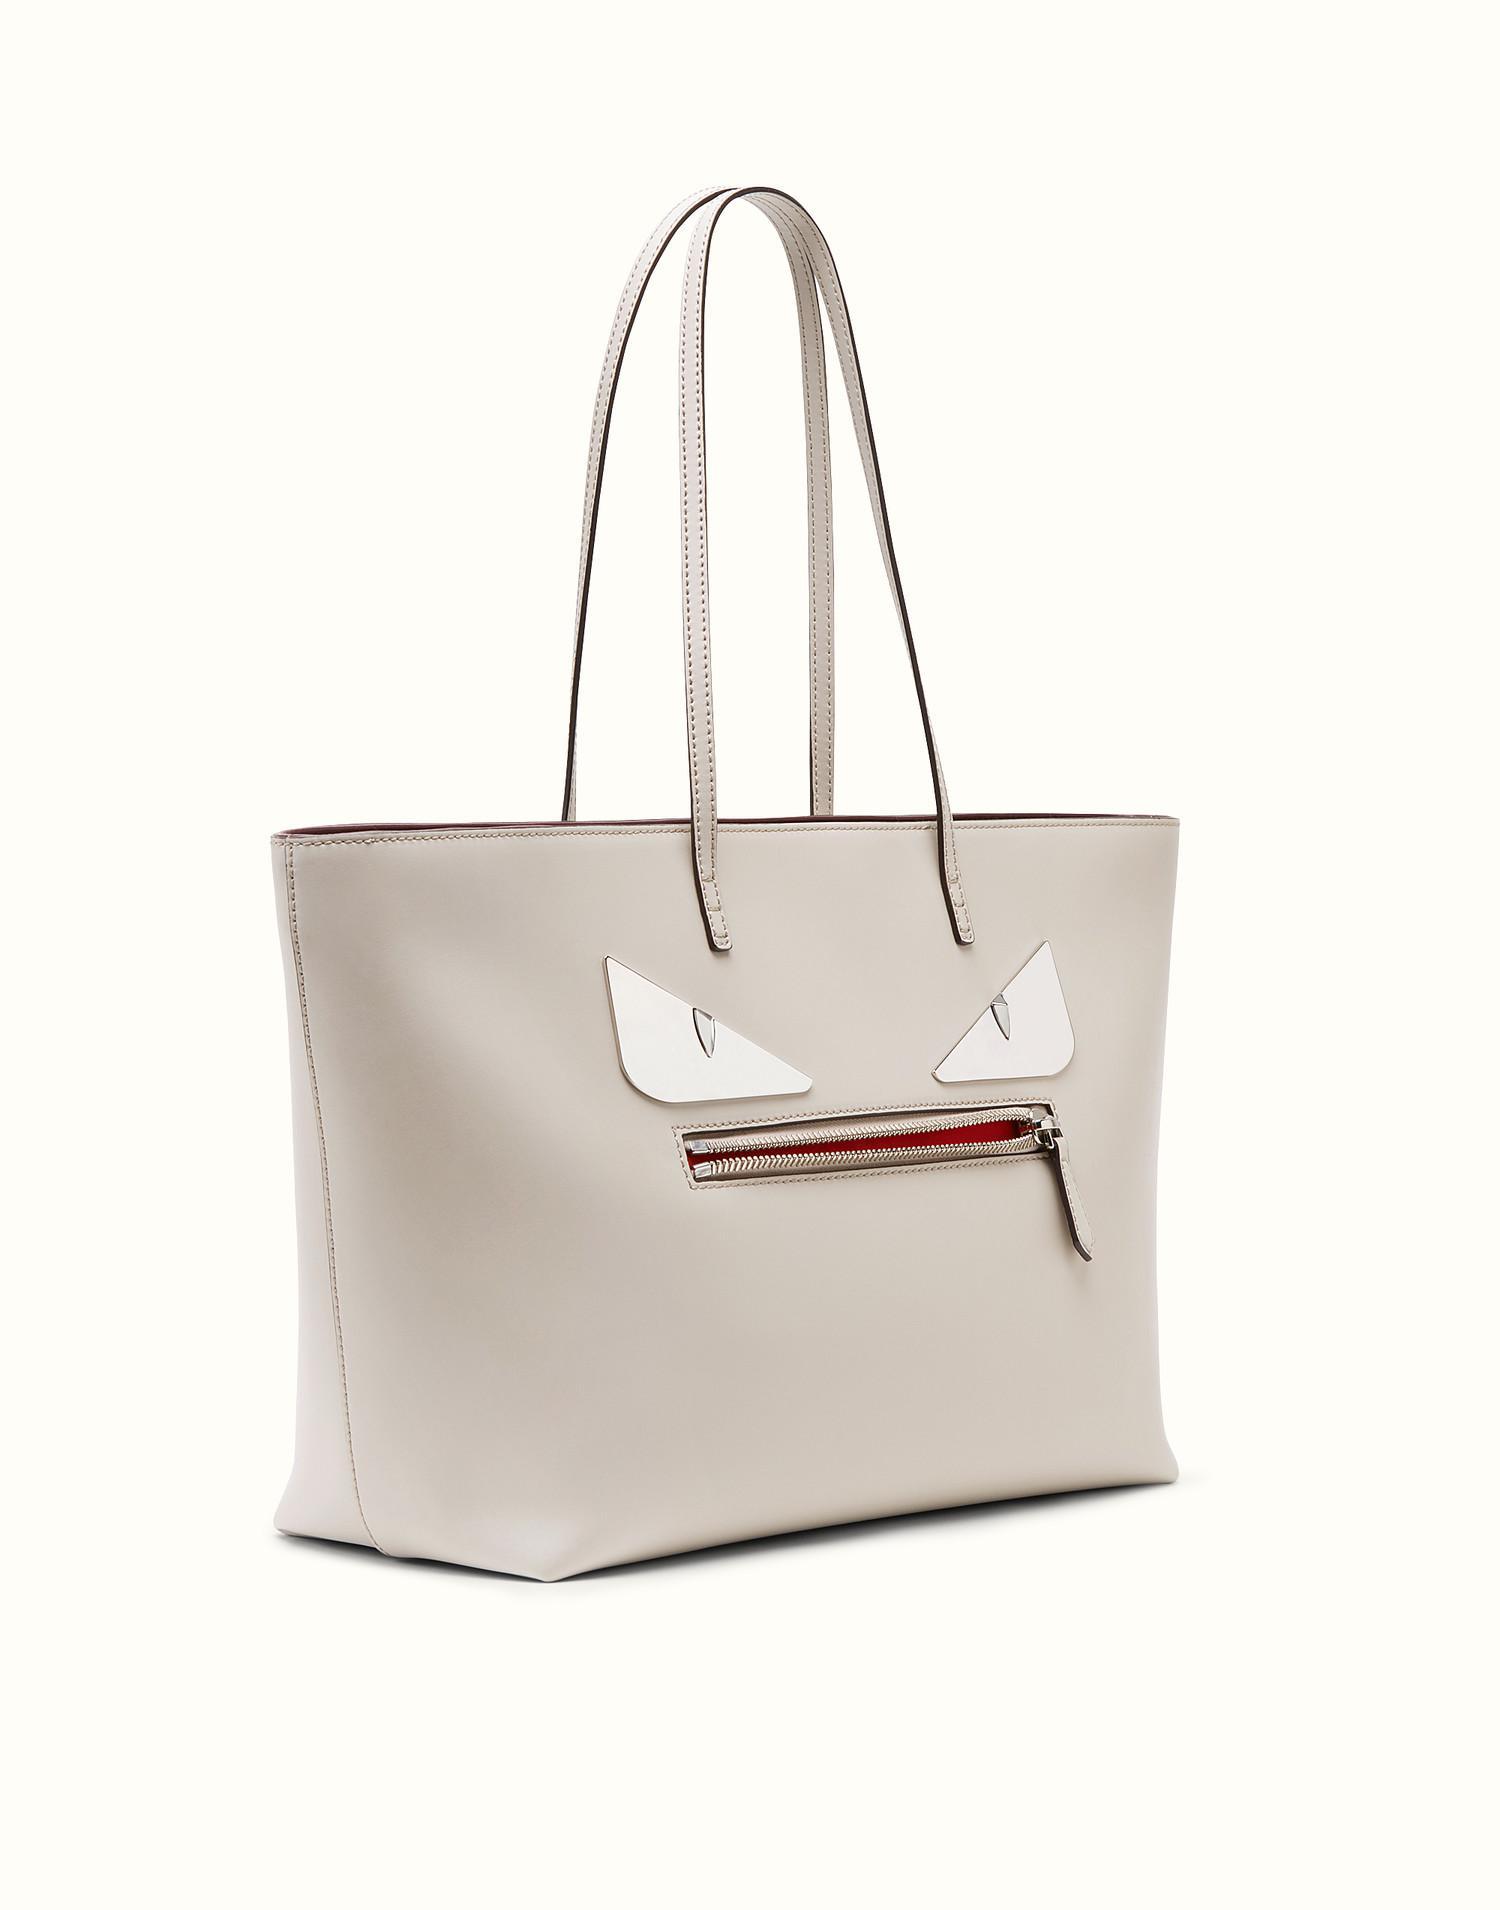 2ee02e9f54 ... new zealand fendi roll bag roll bag in grey save 11 lyst c959f c14e1 ...